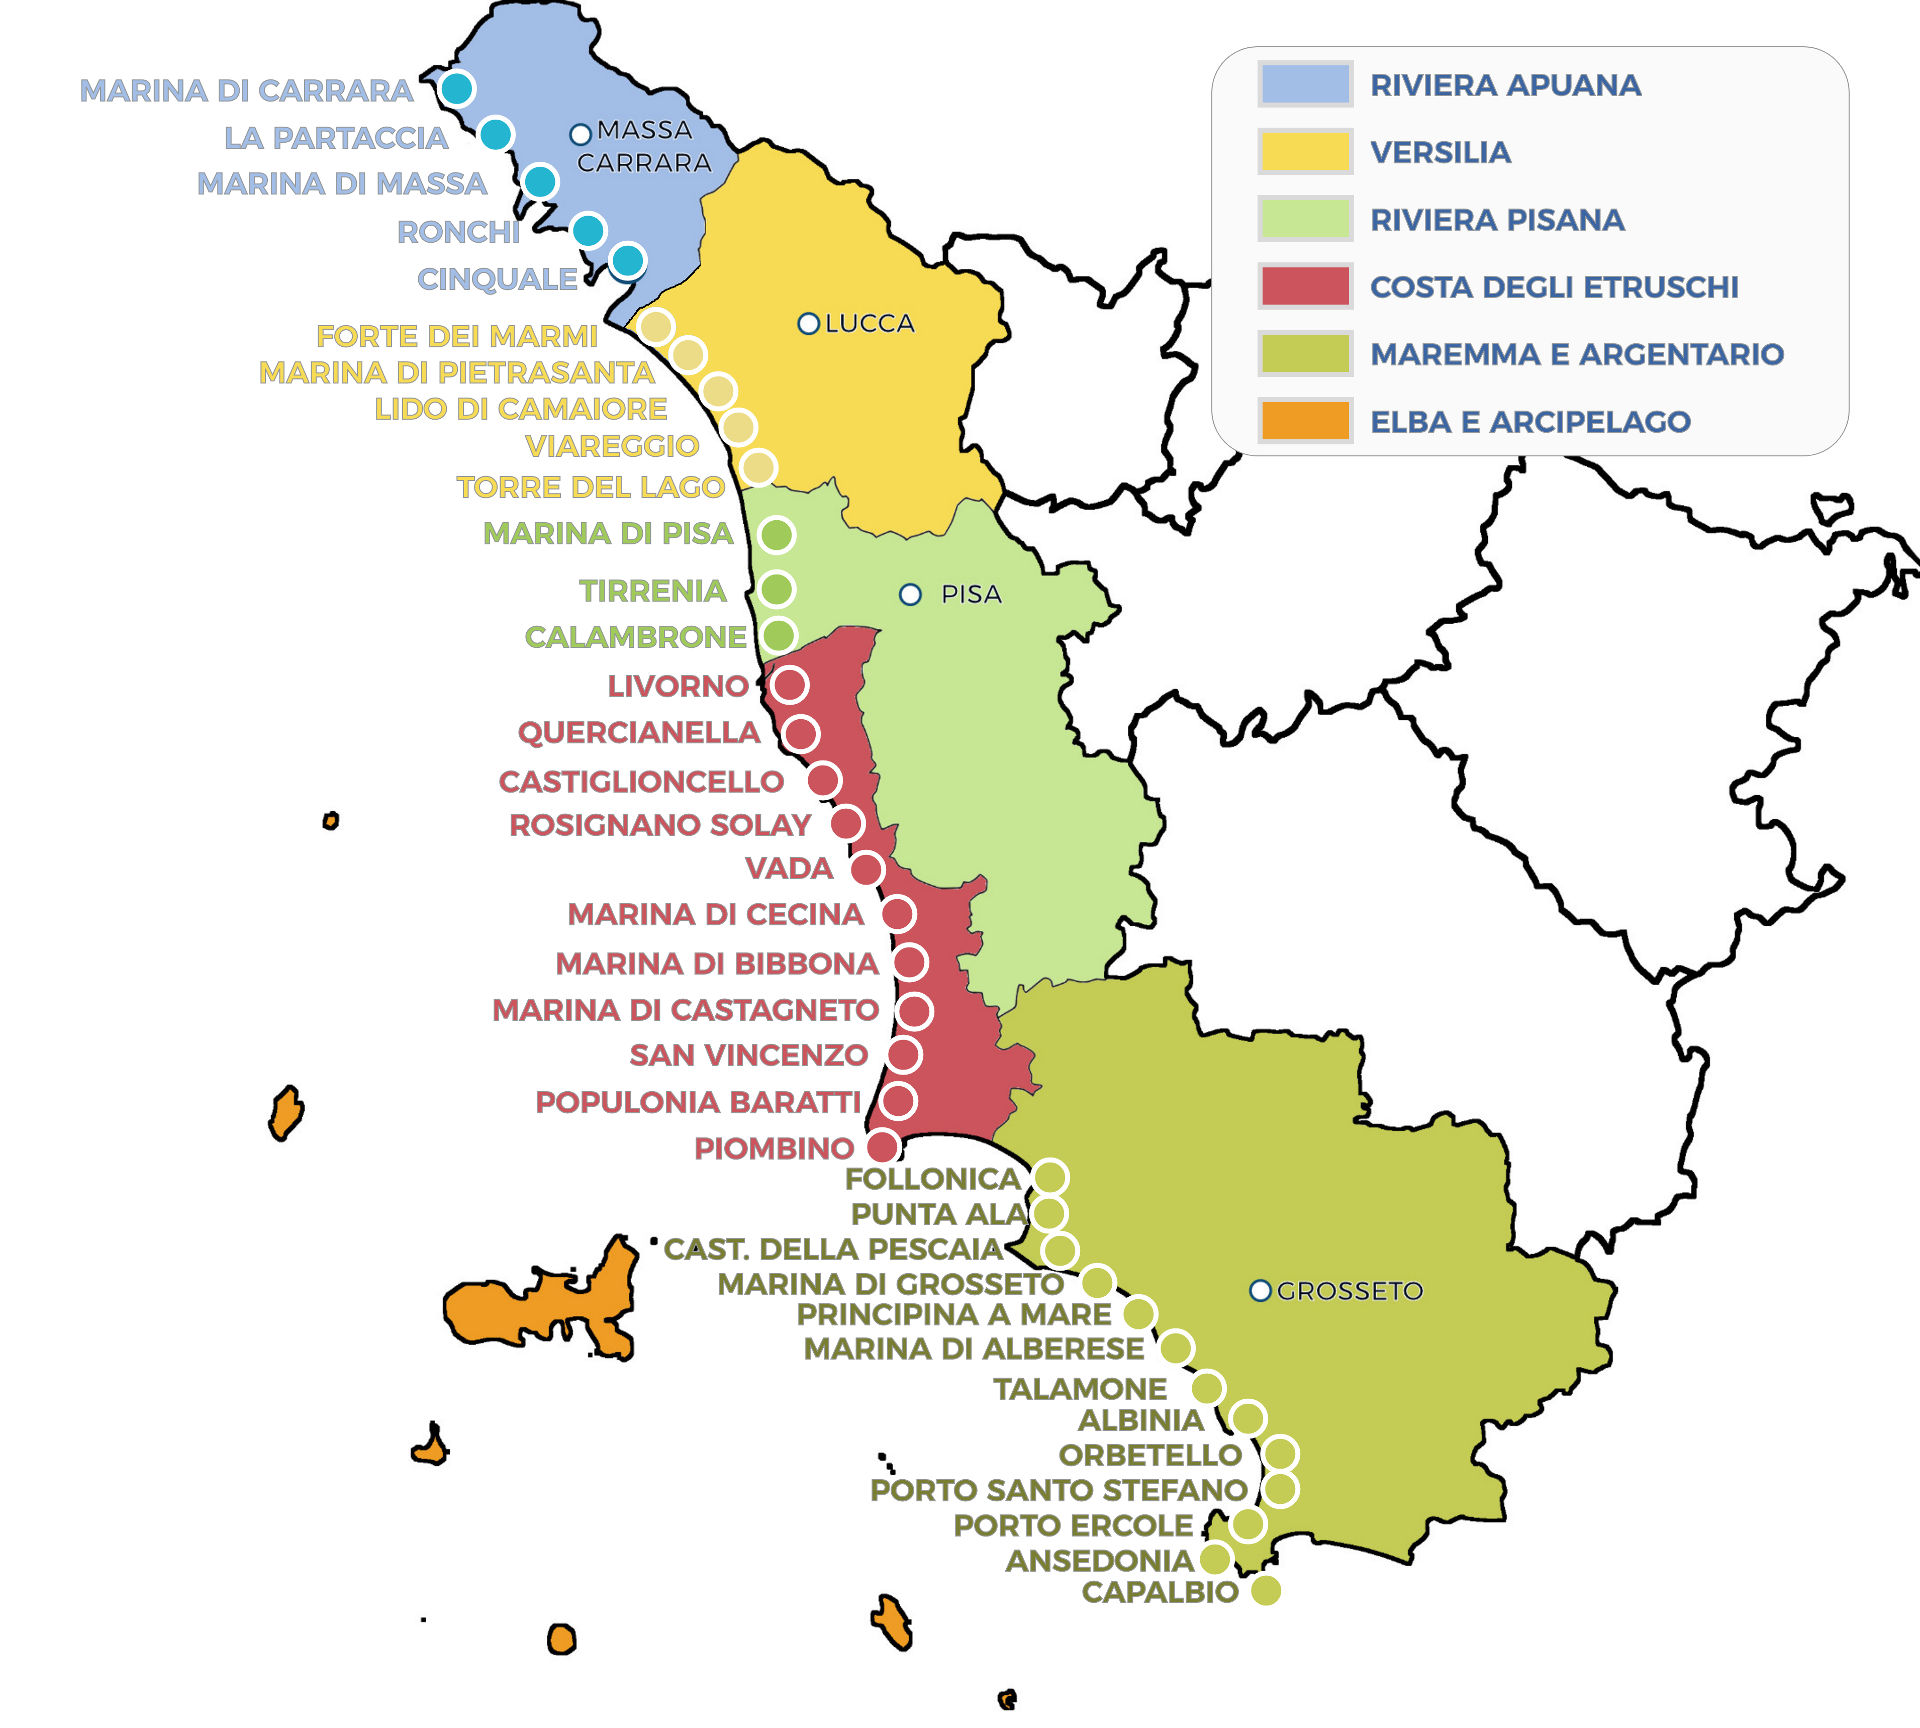 Cartina Toscana Dettagliata.Toscana Mare Cartina Spiagge Mare Della Toscana